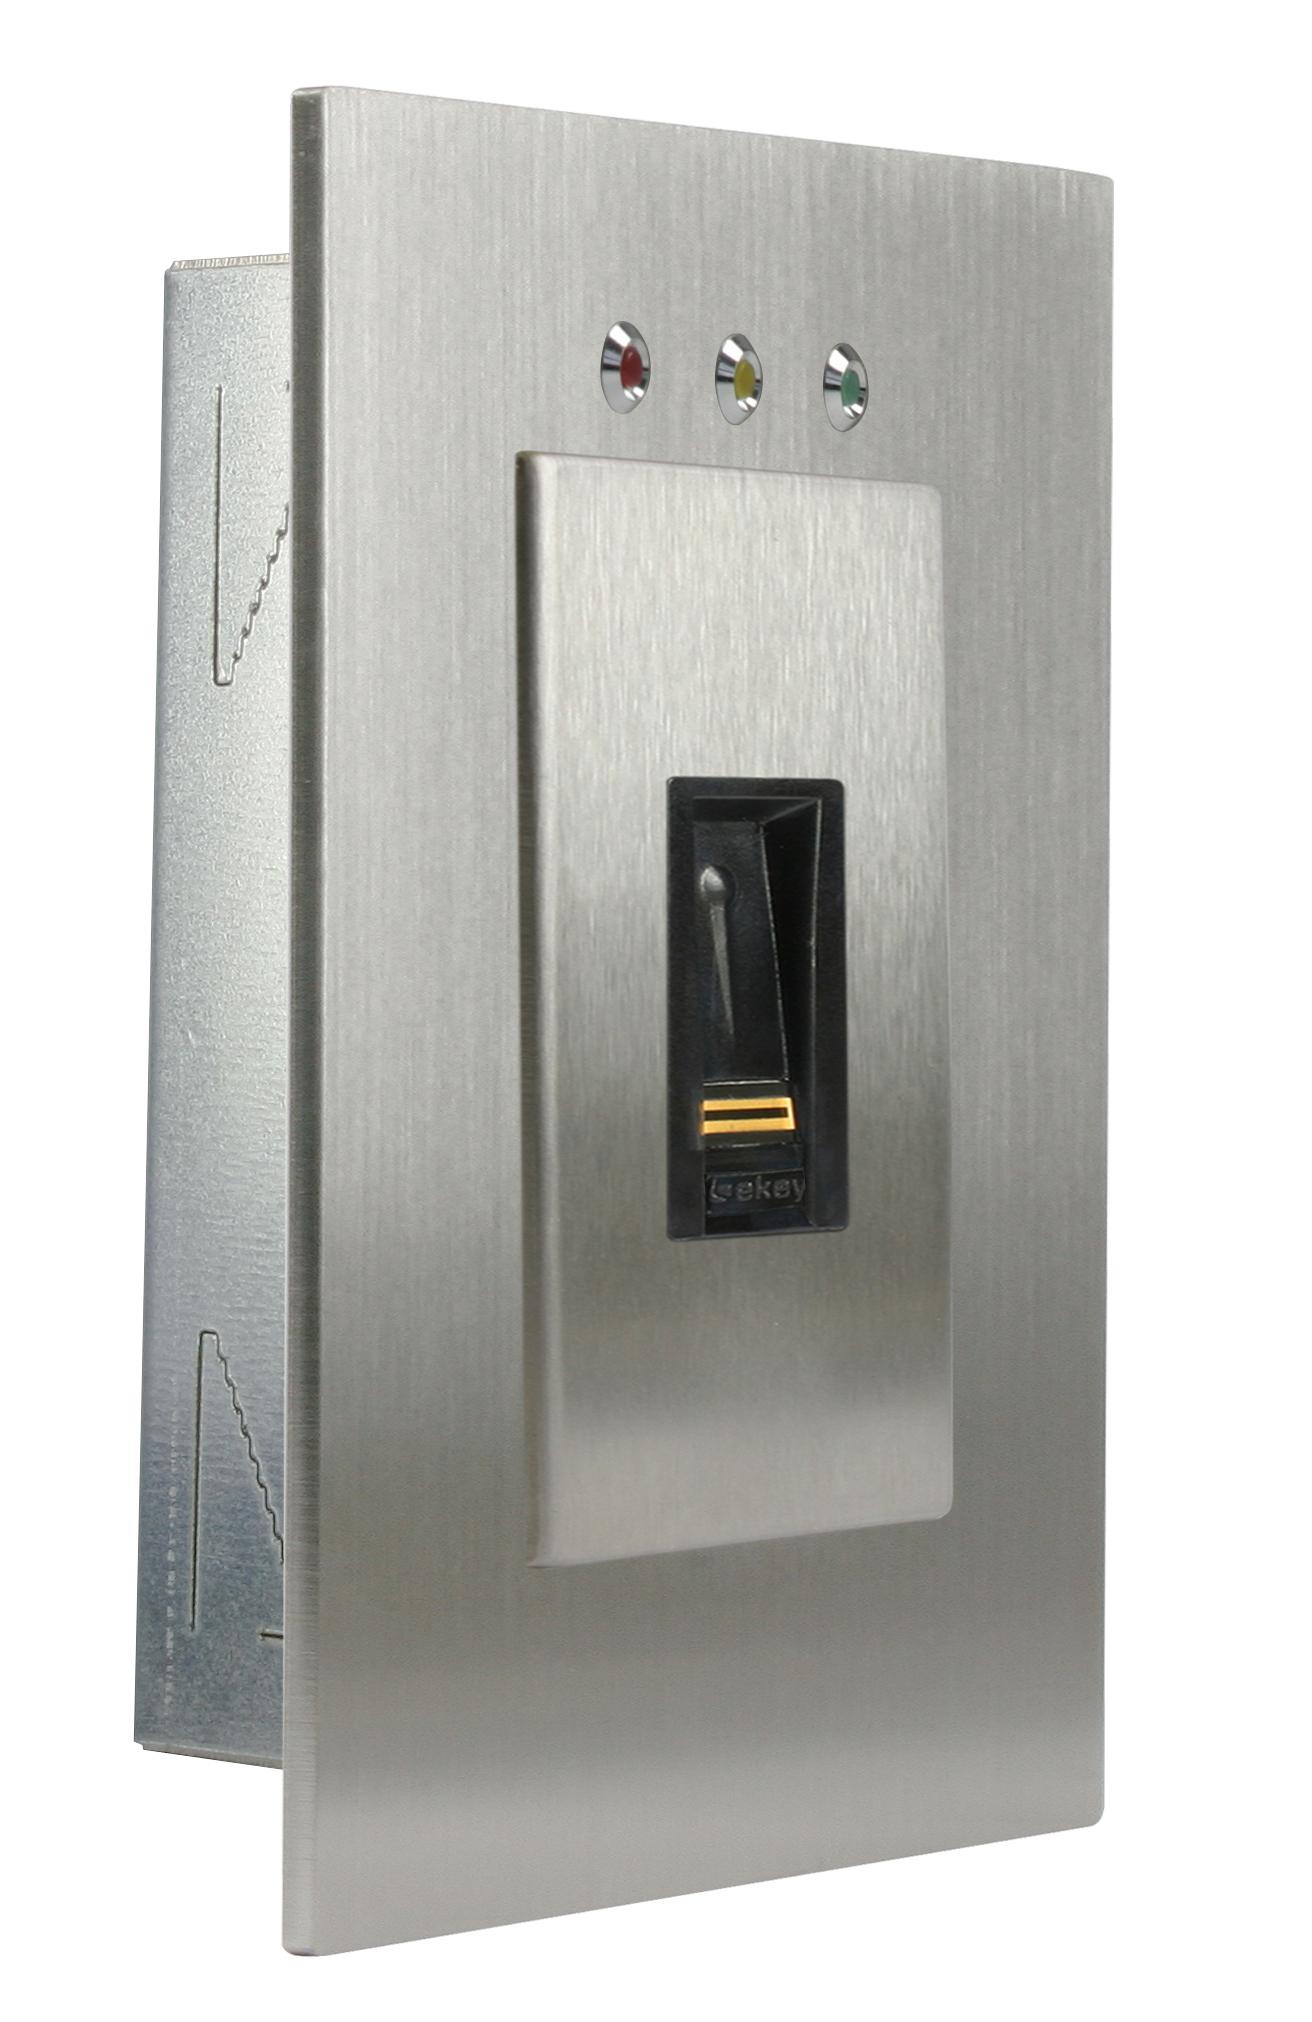 1 Stk Wandeinbauset mit Alarm LED für Fingerscanner Integra EK101301--